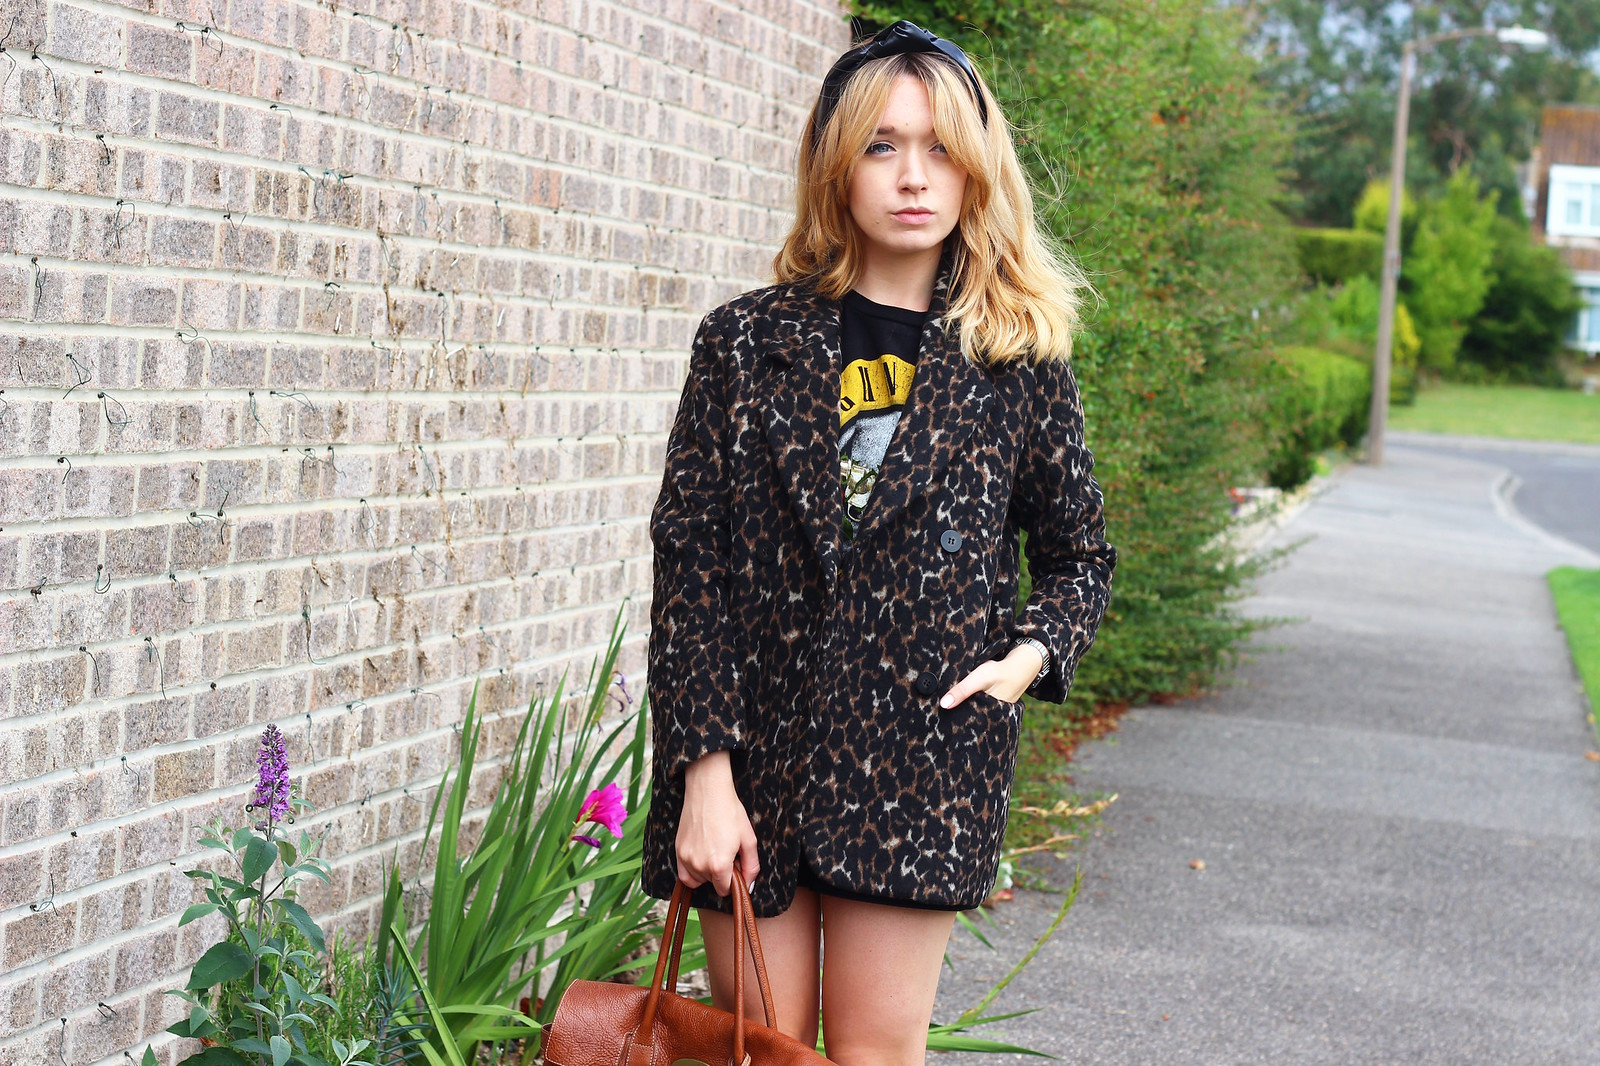 1leopardprintjacket, leopard print jacket h&m, outfit, retro, style